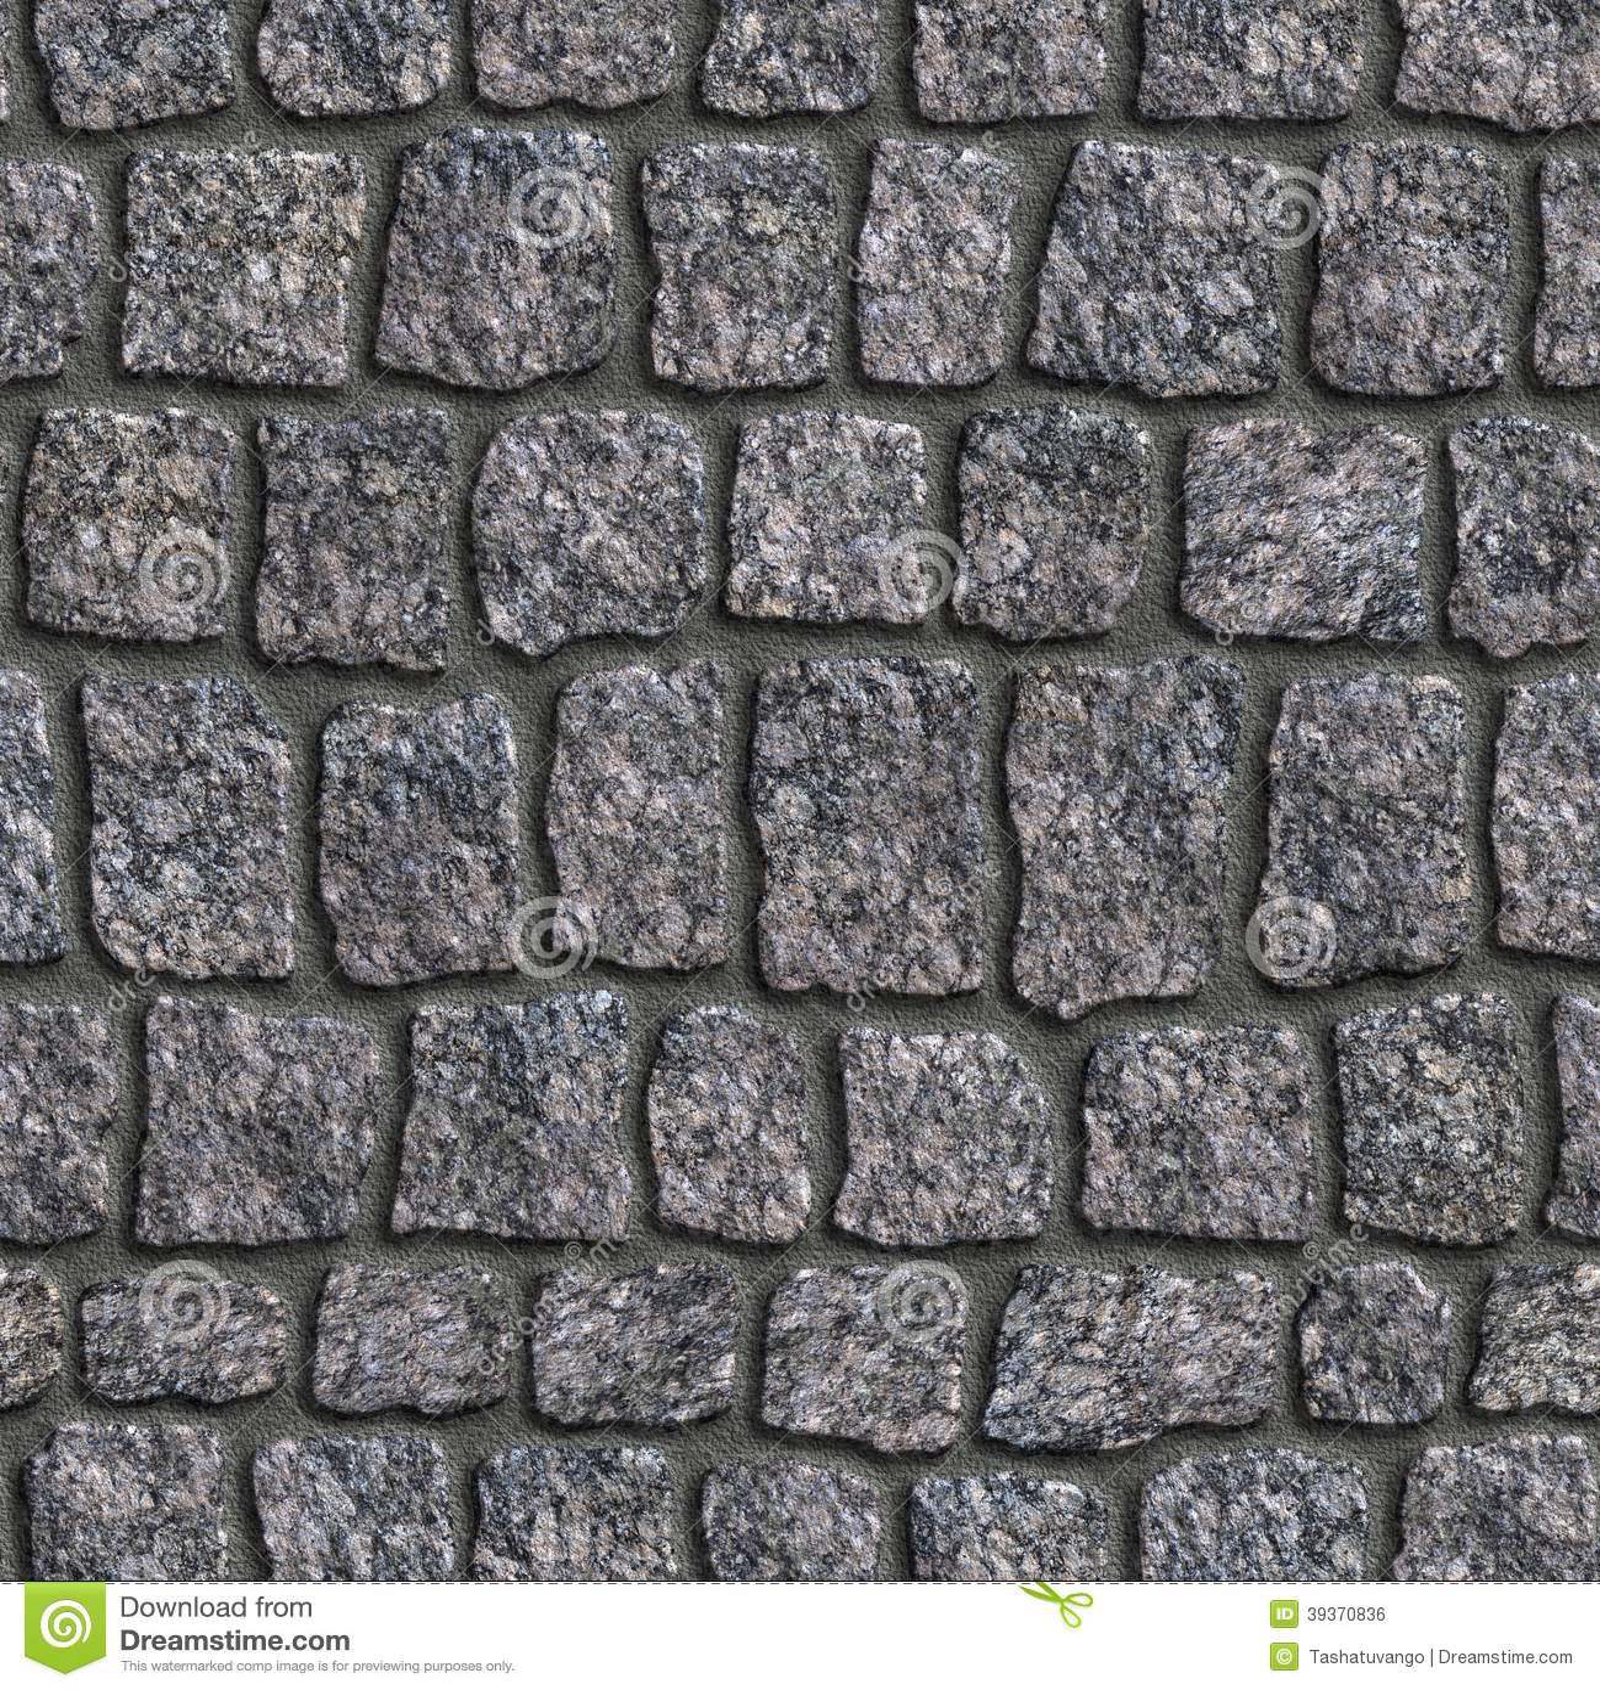 Granite Sett Seamless Tileable Texture Stock Photo Image Of Retro Paver 39370836